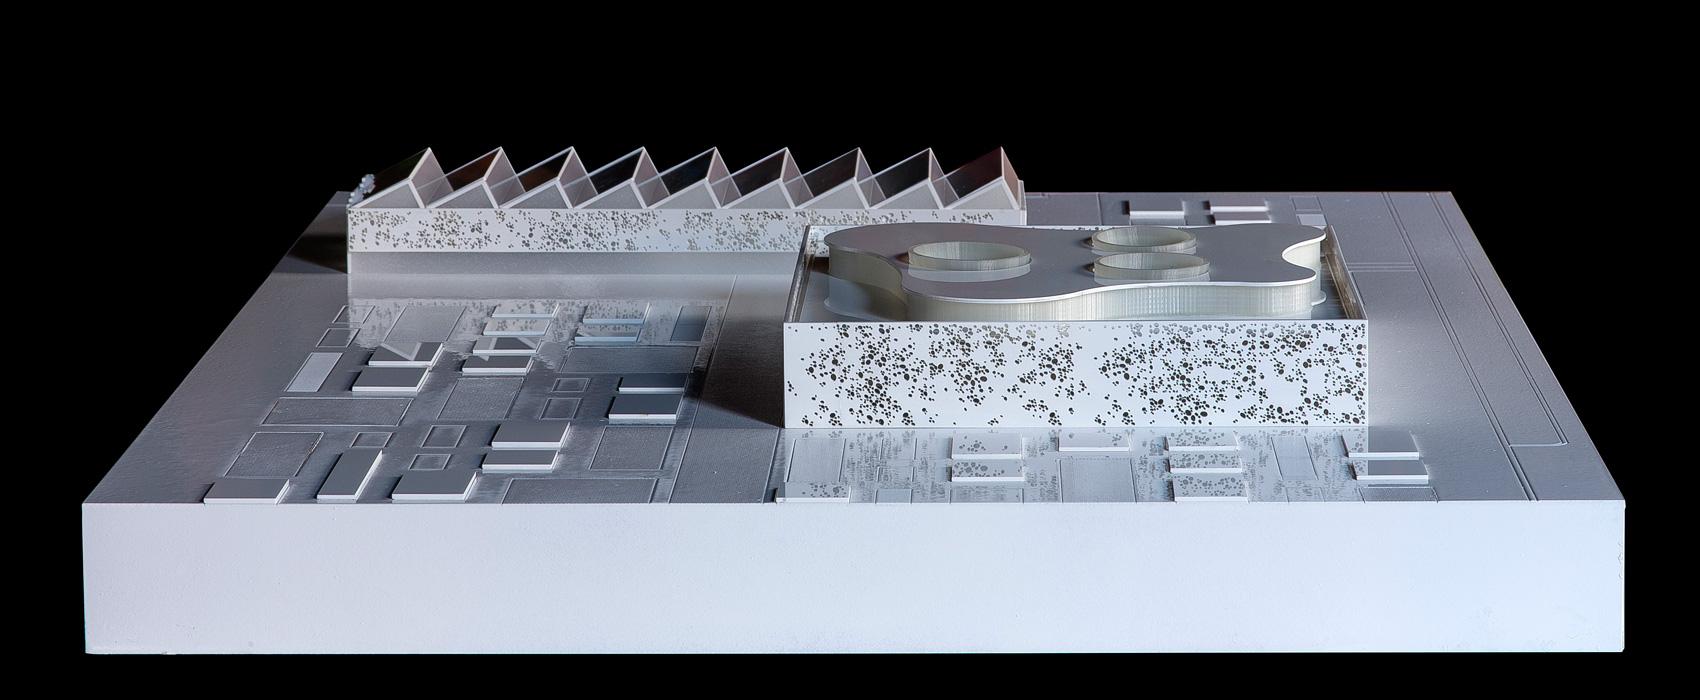 maqueta-arquitectura-concurso-valencia-iluminada-pfc-centro-musical-7